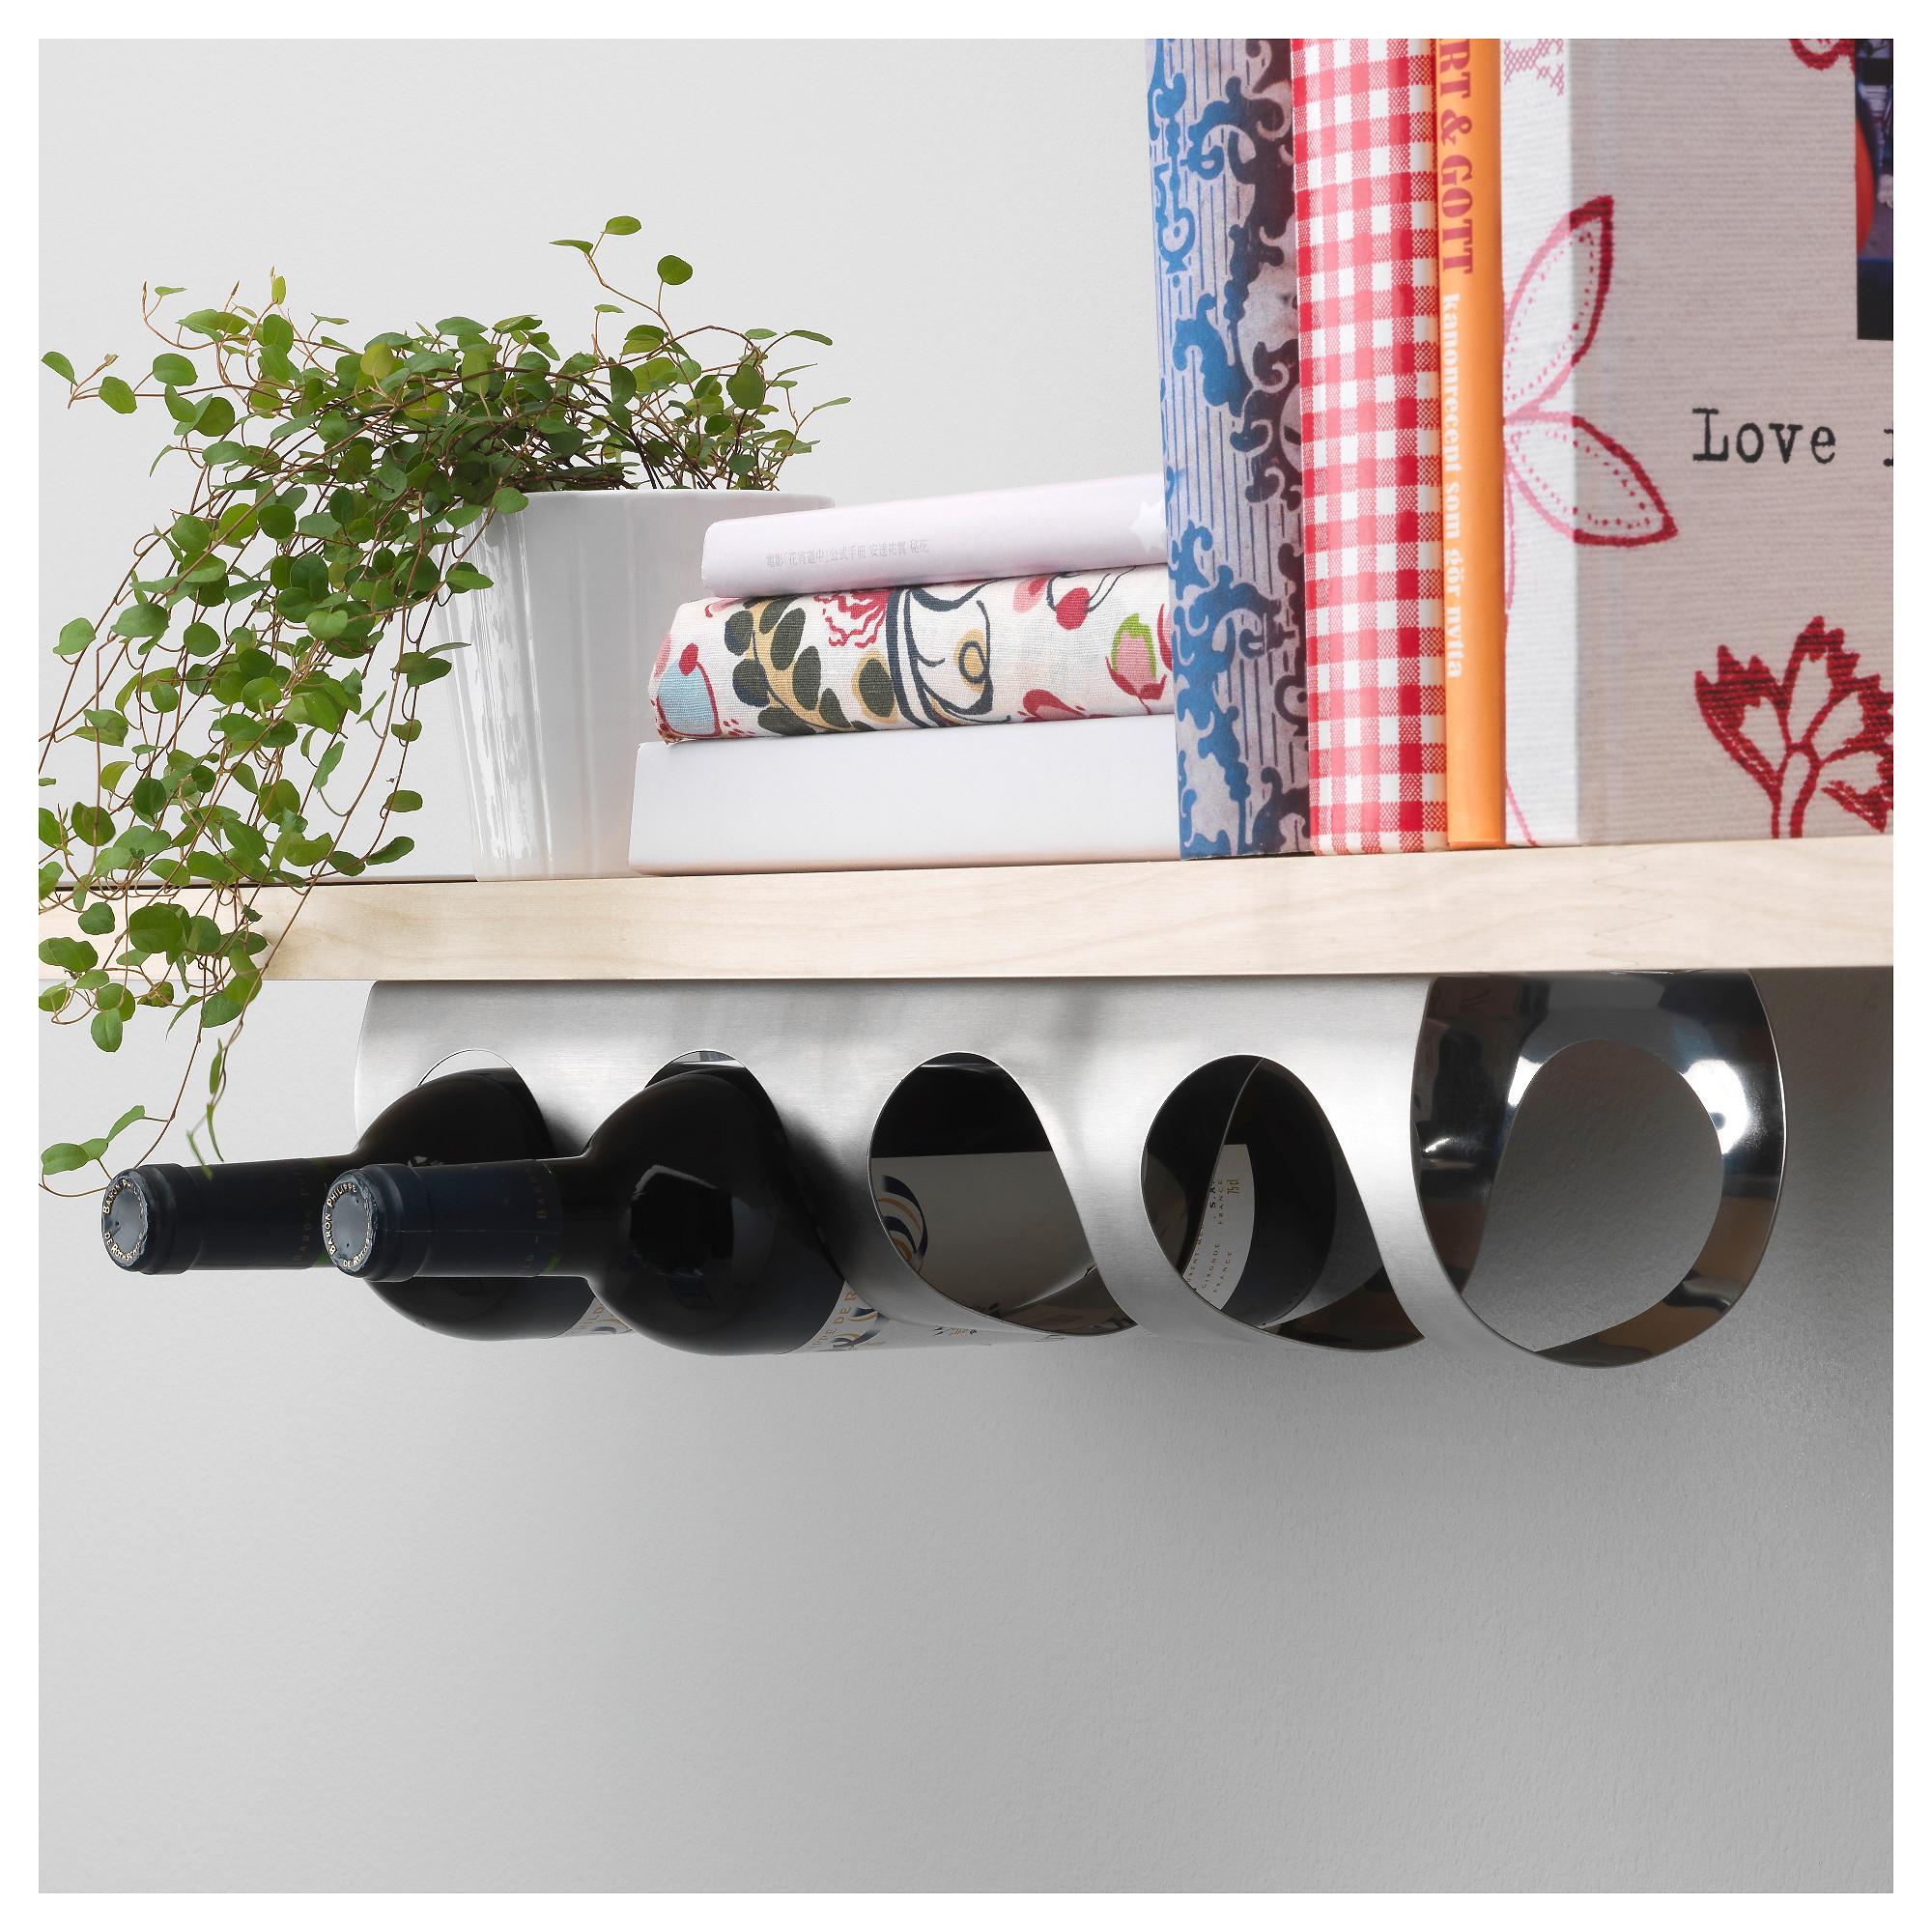 IKEA VURM 4bottle wine rack stainless steel Products